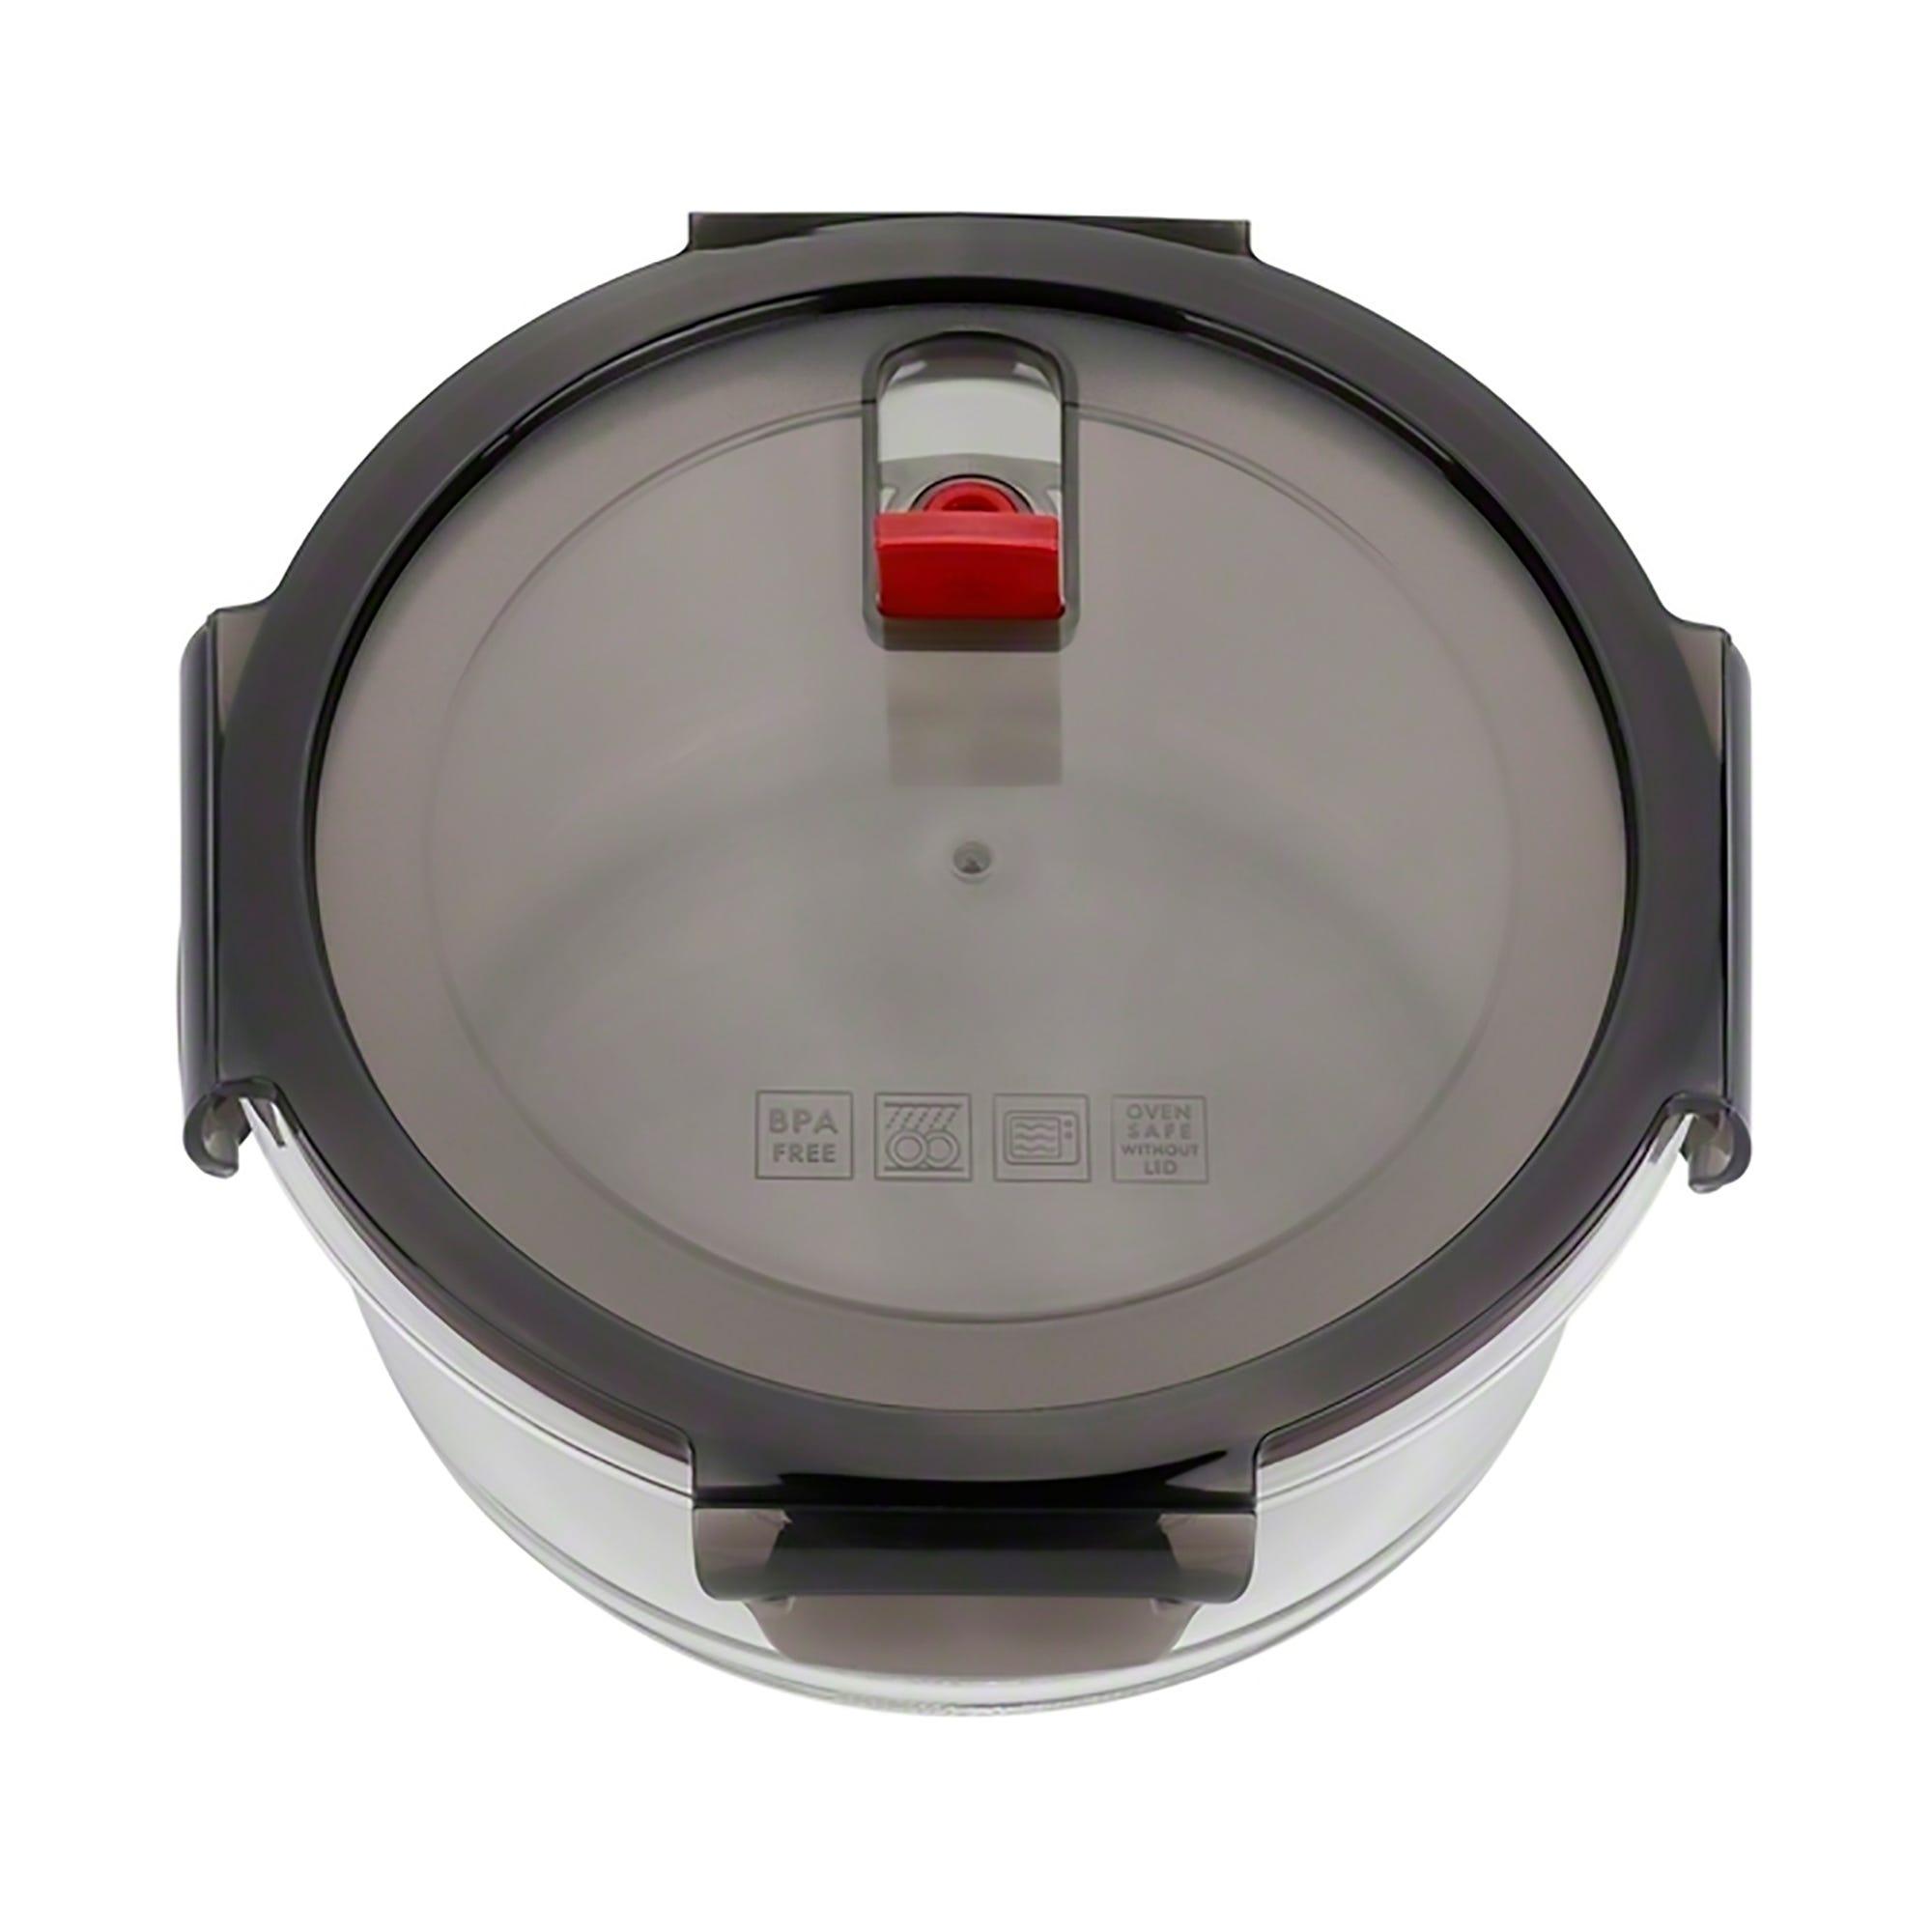 Contenedor de vidrio Zwilling®, redondo de 1.3 L